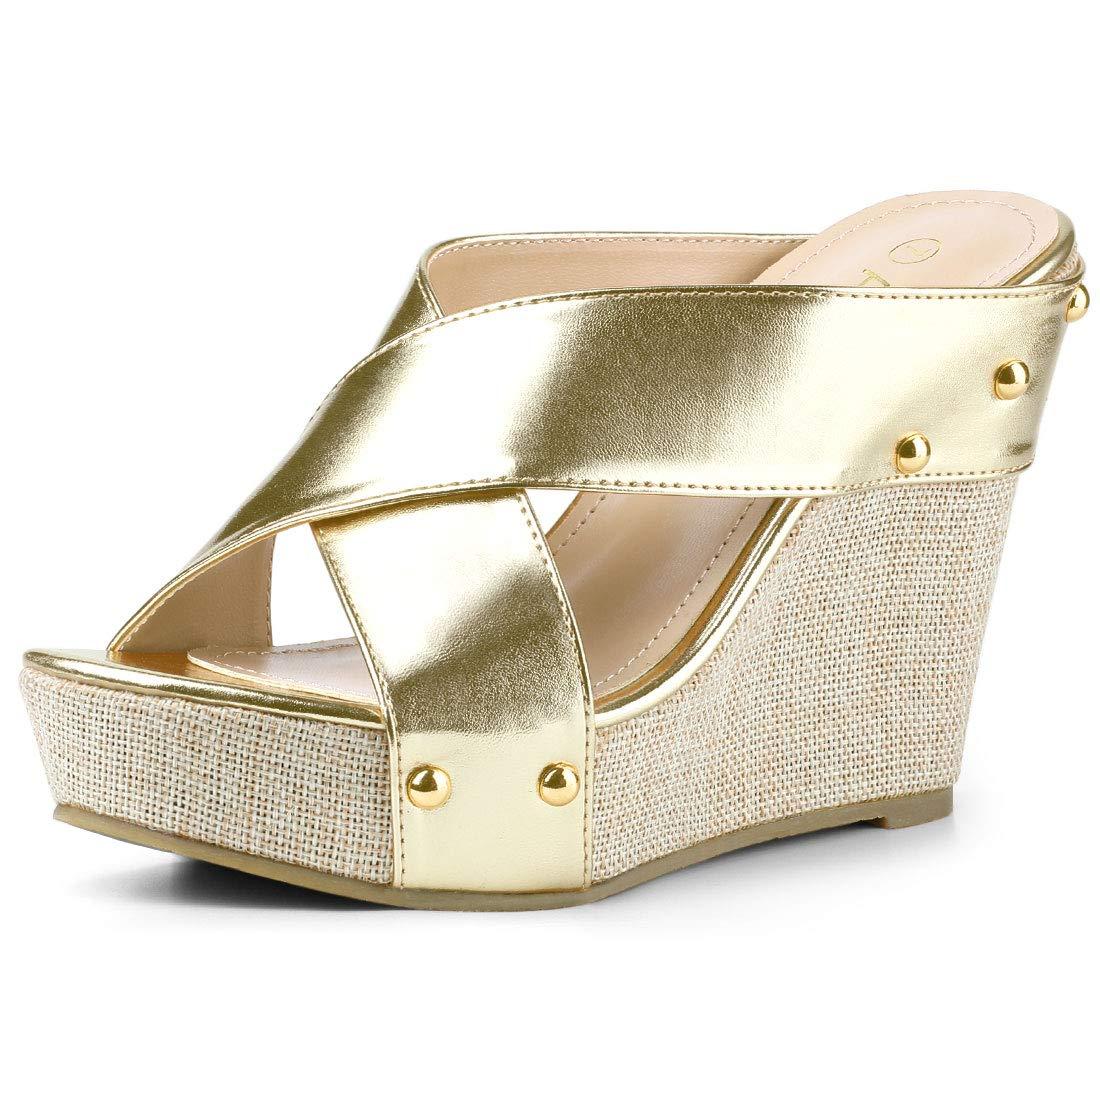 836136a259 Allegra K Women's Platform Slide Wedge Sandals: Amazon.ca: Shoes & Handbags